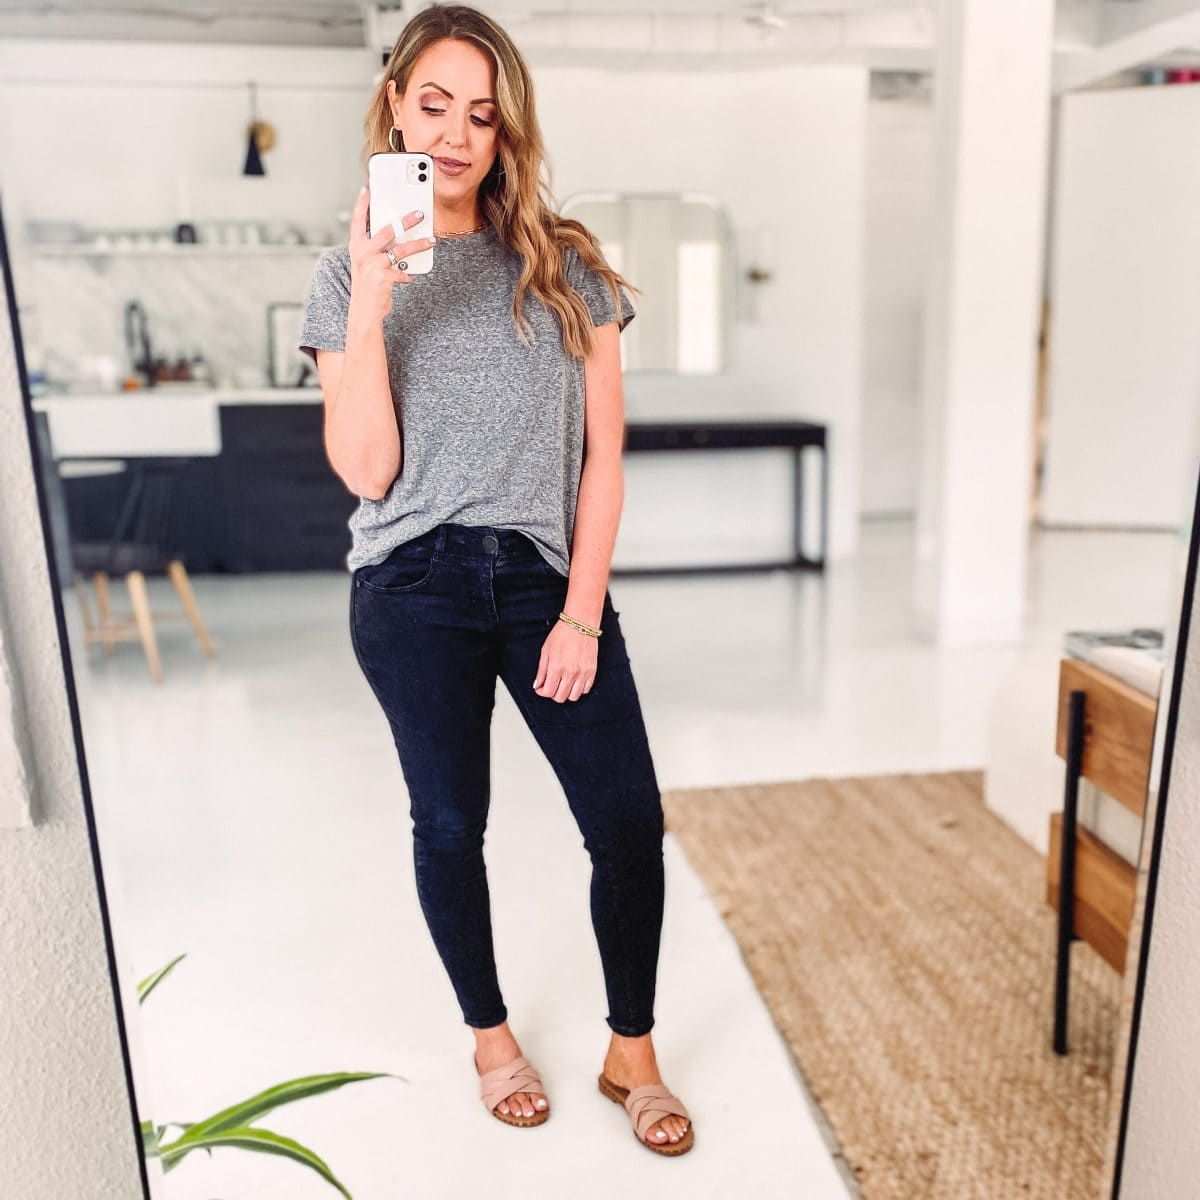 Houston blogger Meg O. shares cute Amazon sandals for summer 2021.